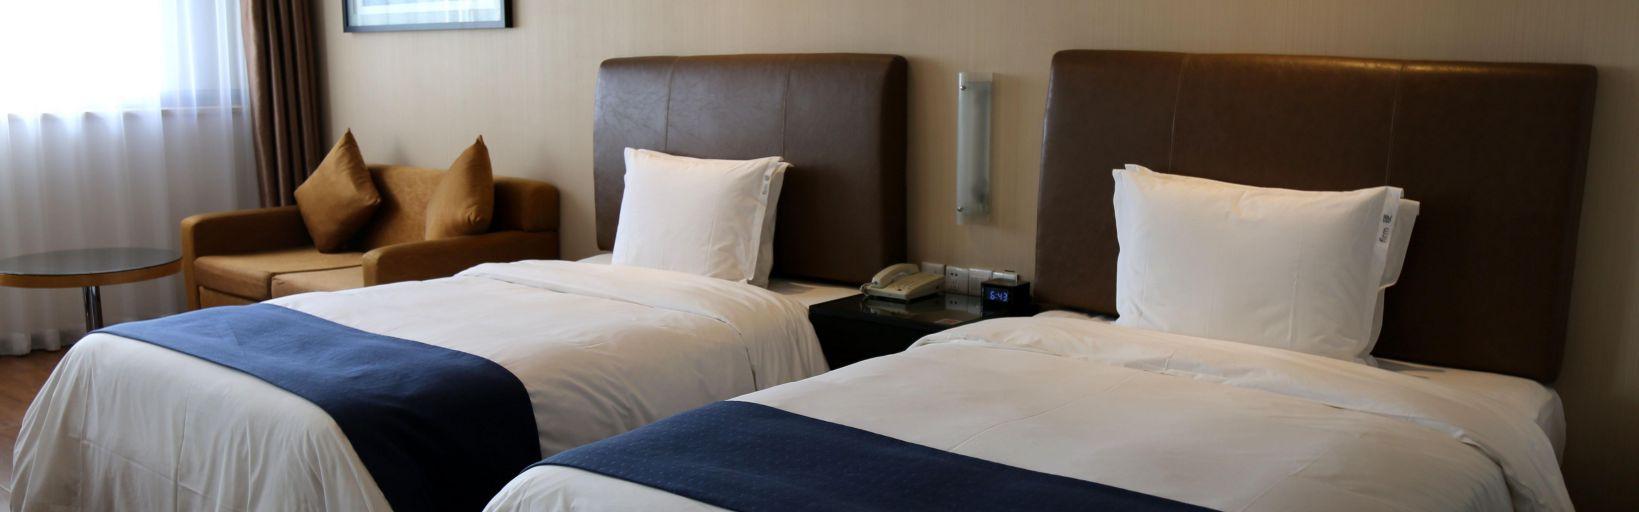 holiday inn express shanghai zhabei shanghaiのホテルを予約